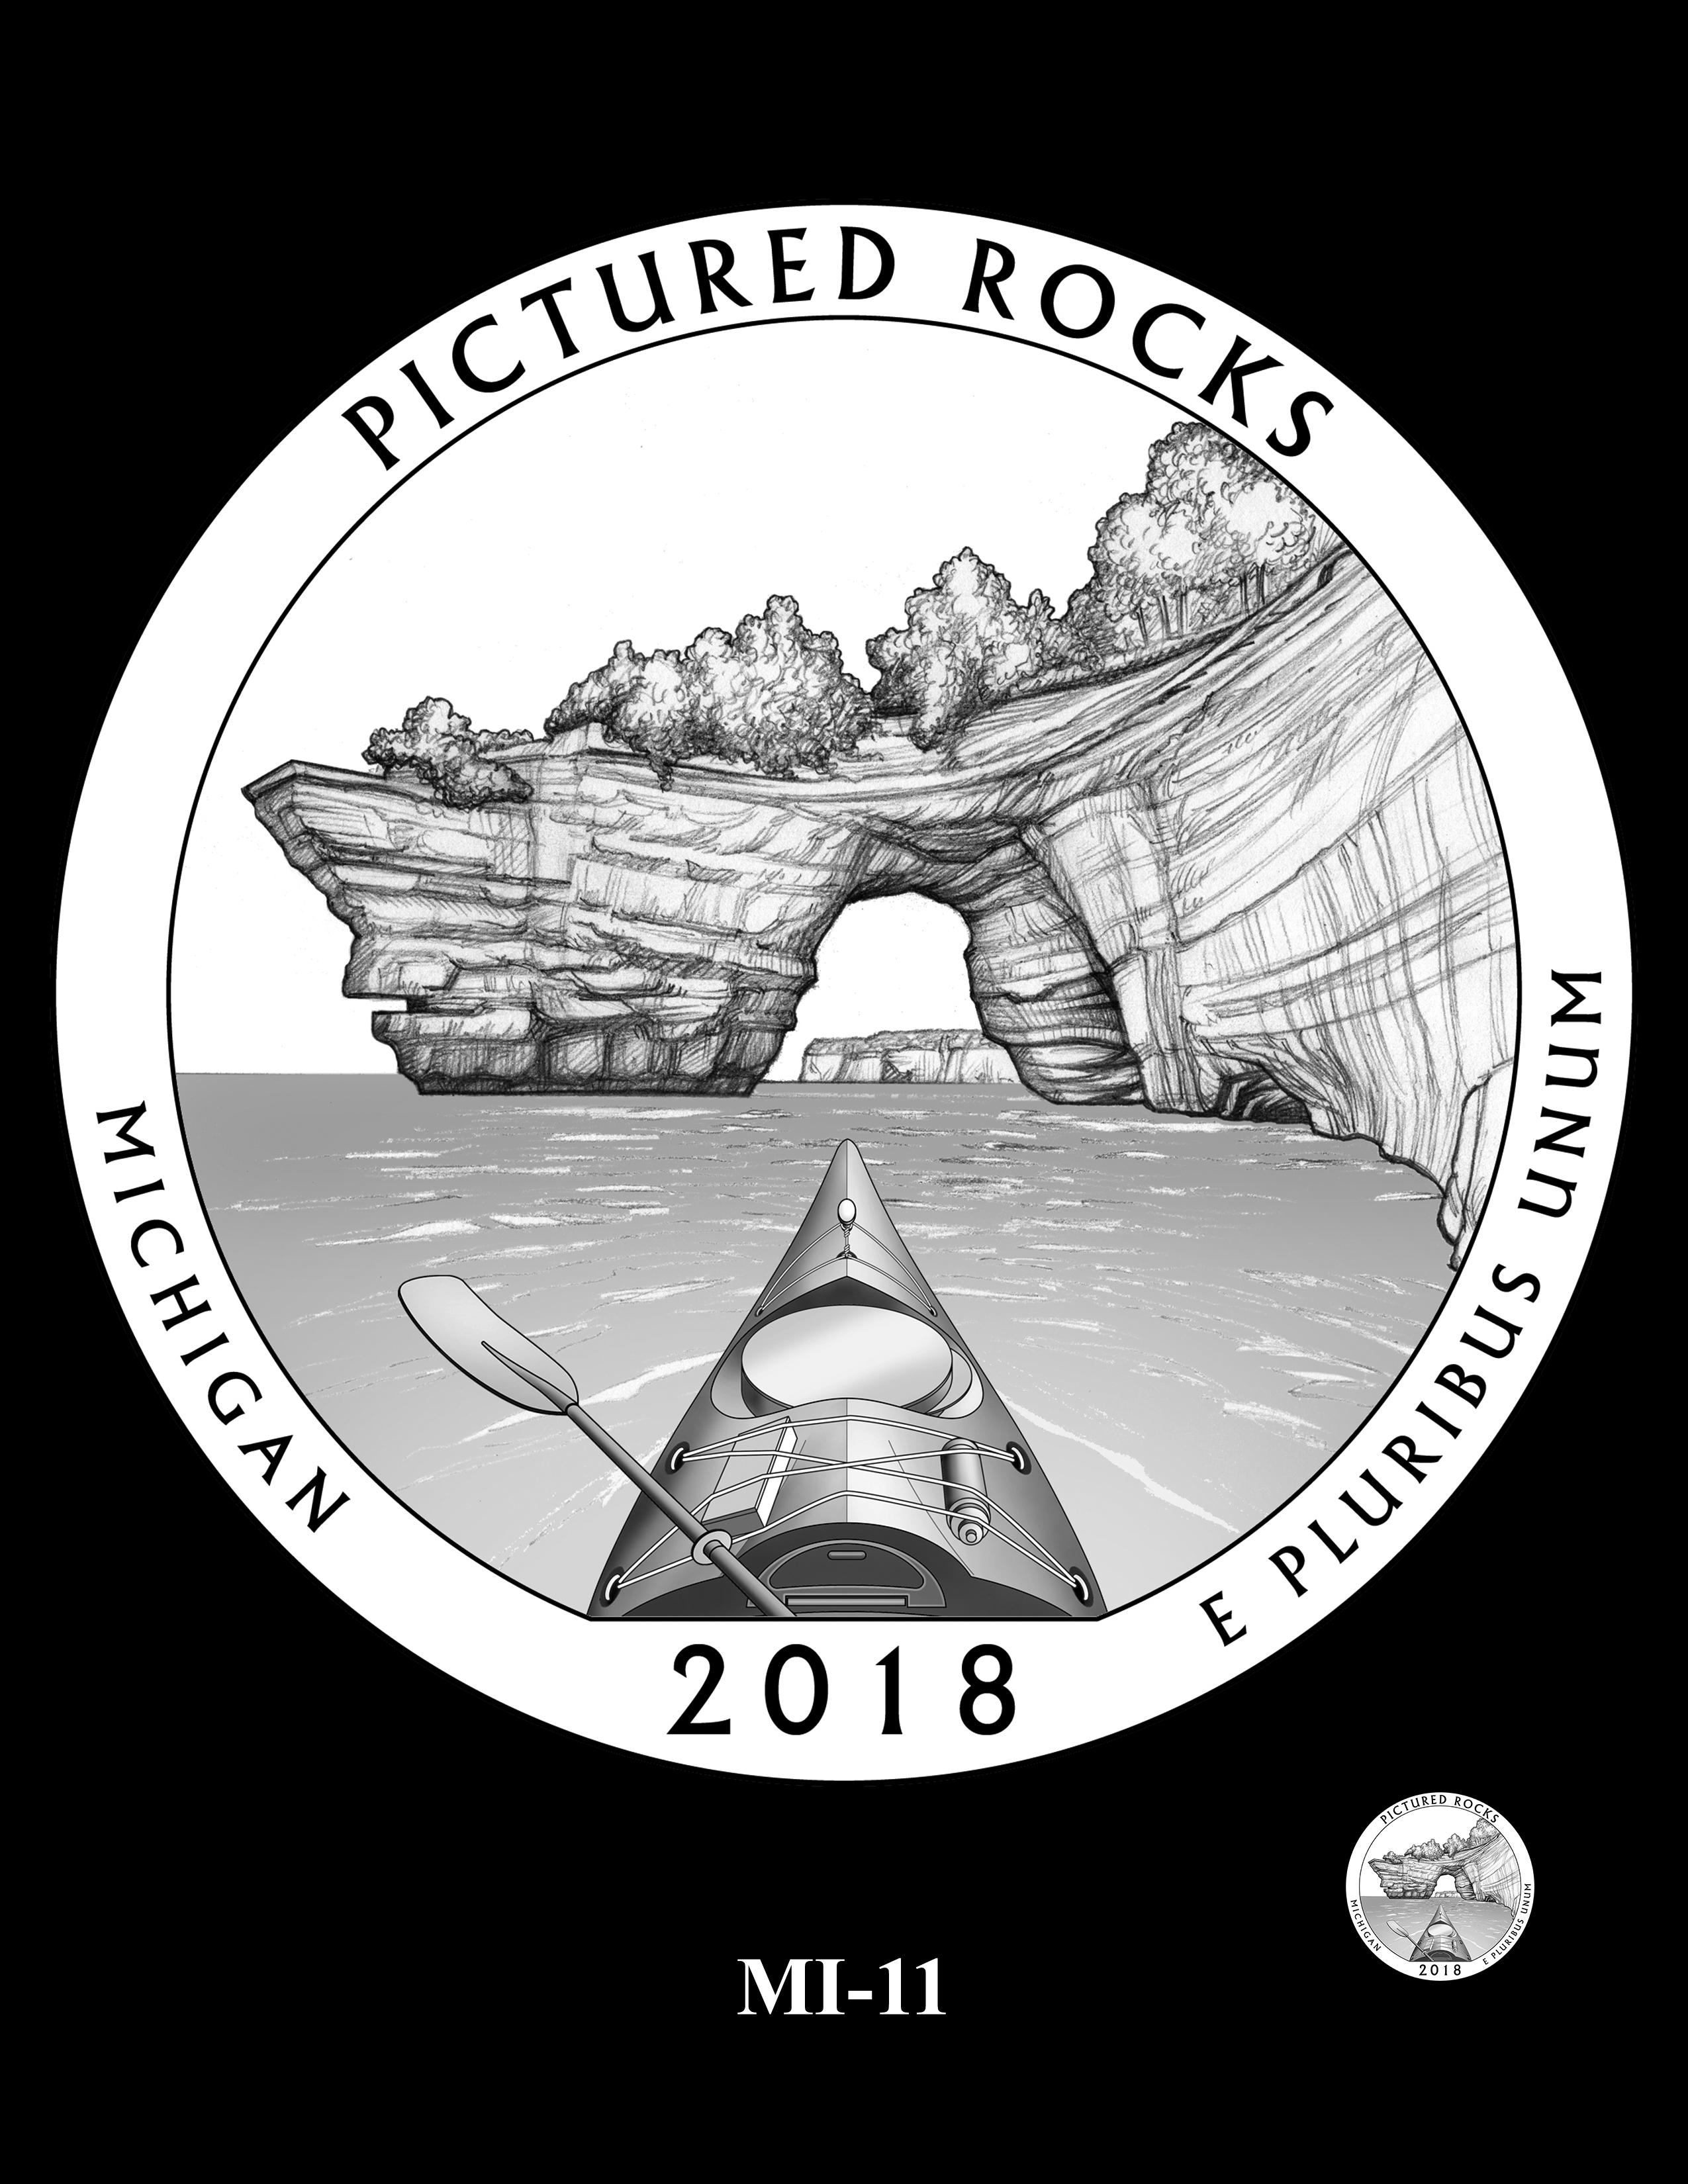 MI-11 -- 2018 America the Beautiful® Quarters Program